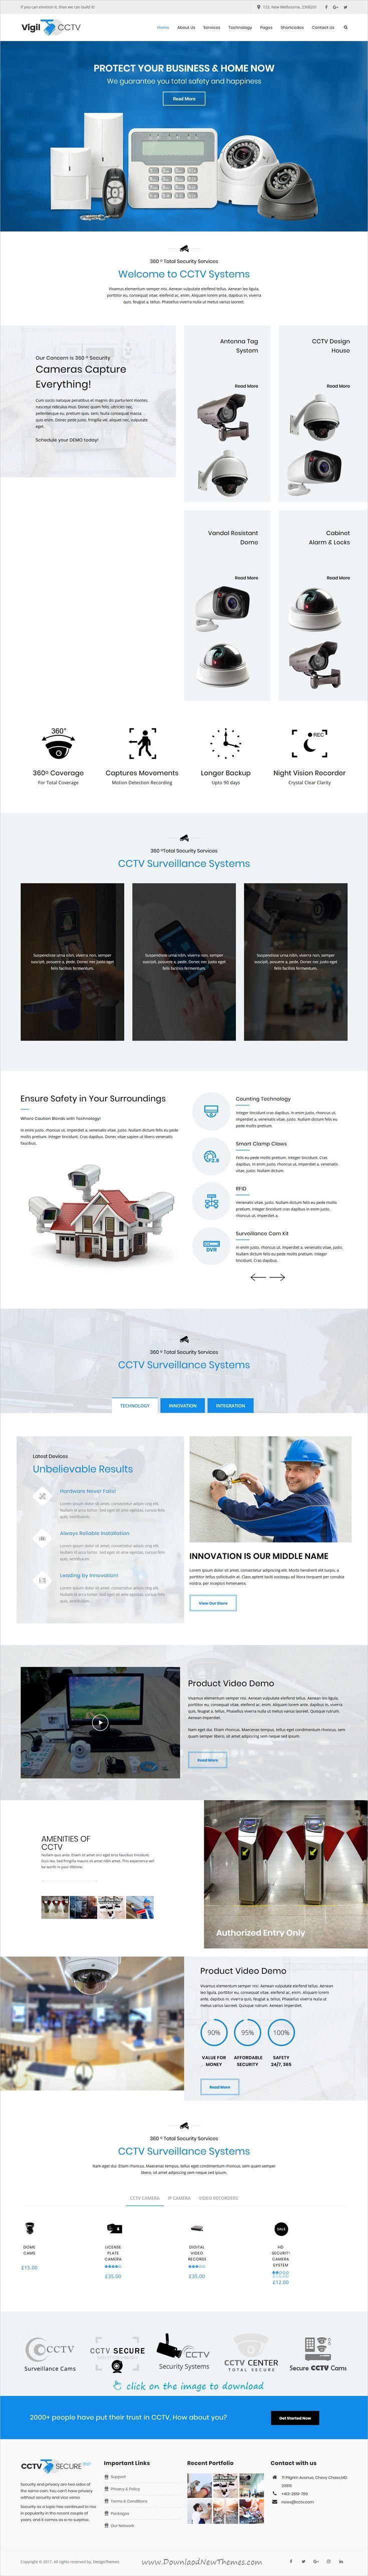 Vigil - CCTV, Security WordPress Theme | Wordpress, Web design ...